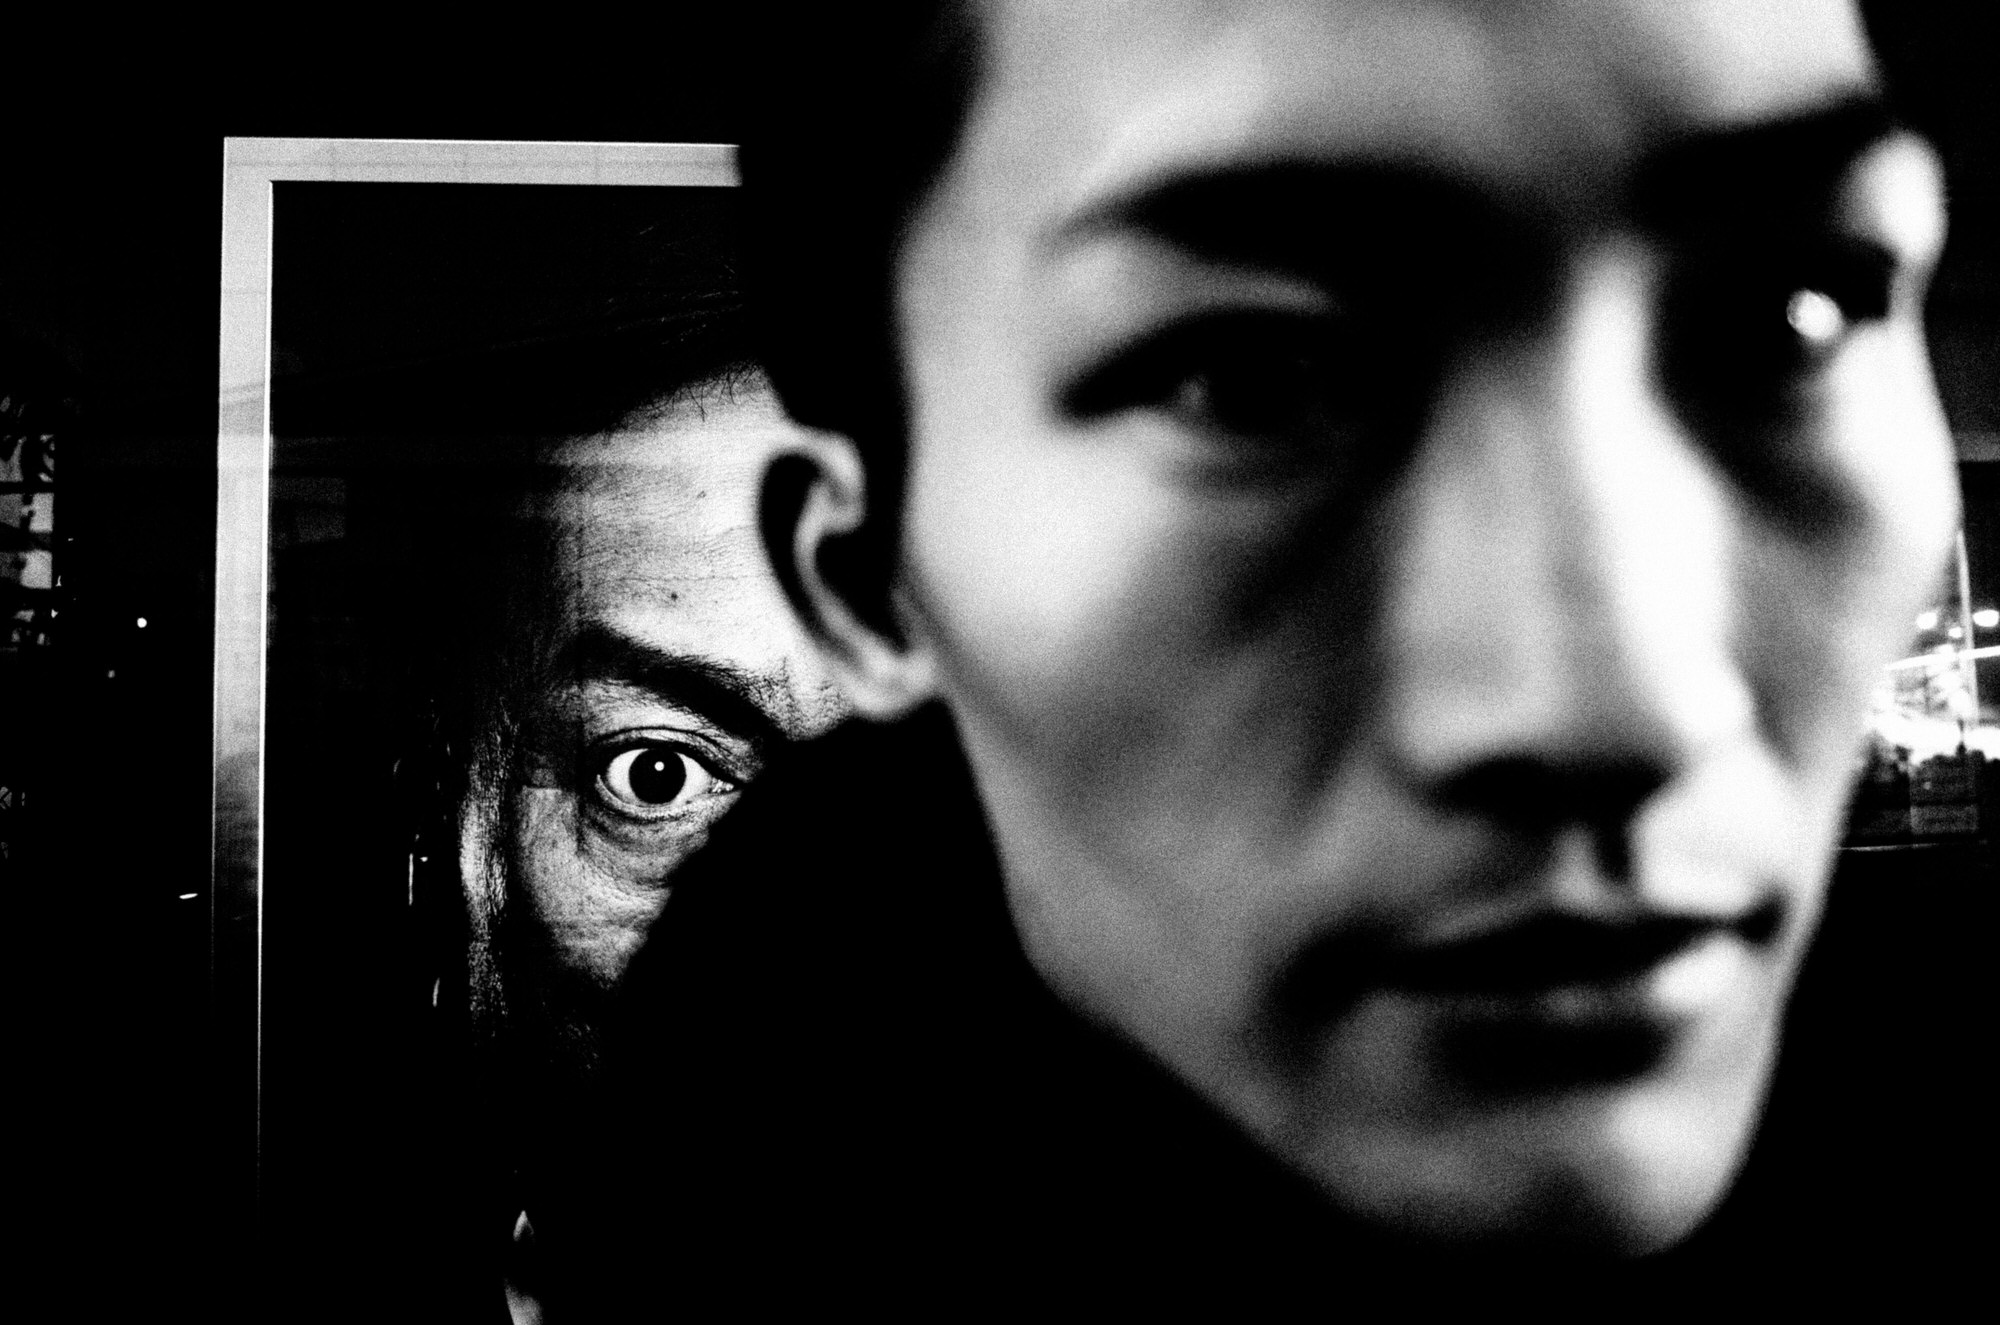 eric kim street photography tokyo-0000545.jpg